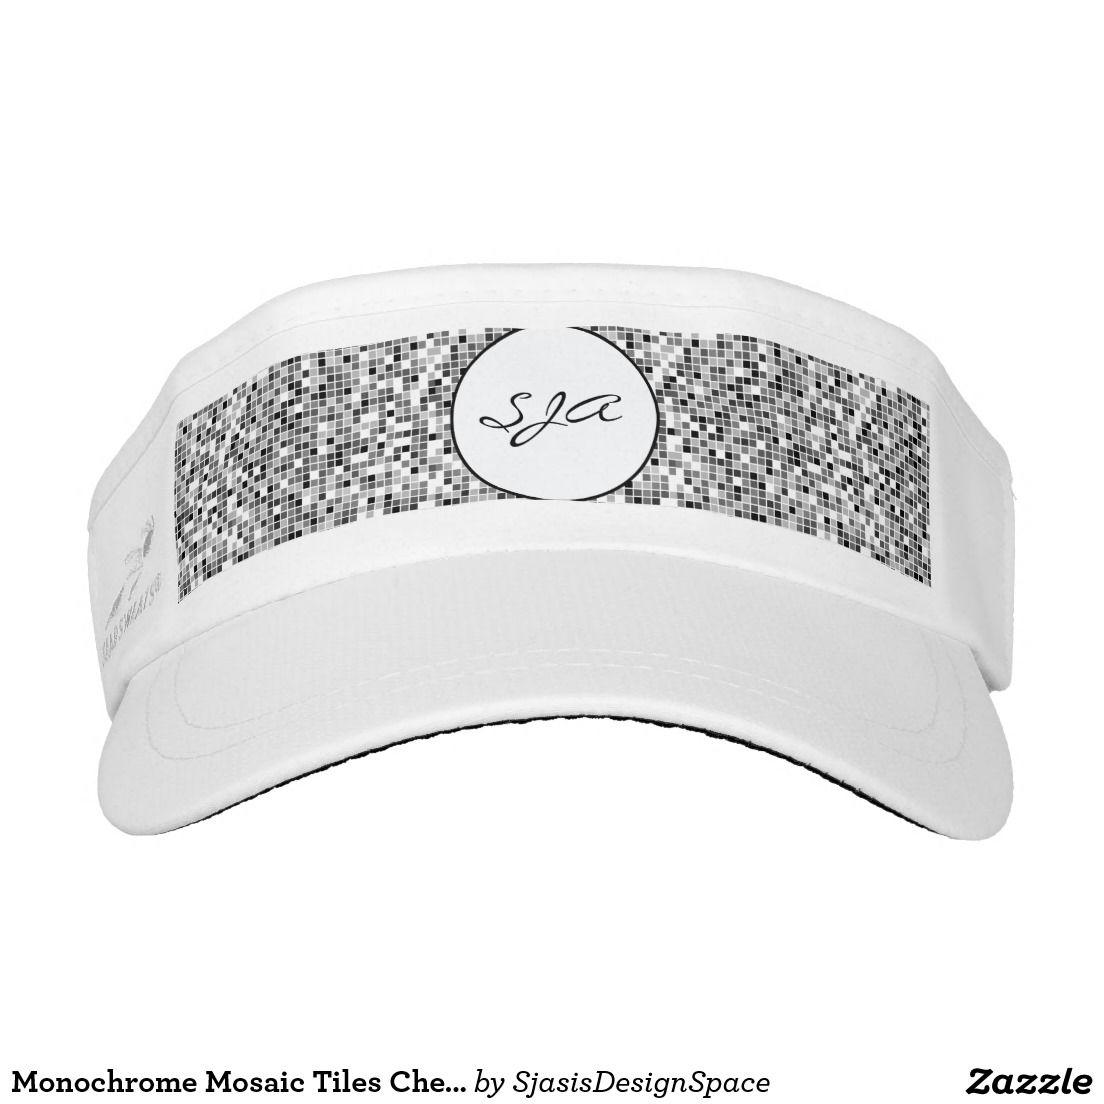 Monochrome Mosaic Tiles Checks Design Sun Visor Headsweats Visors